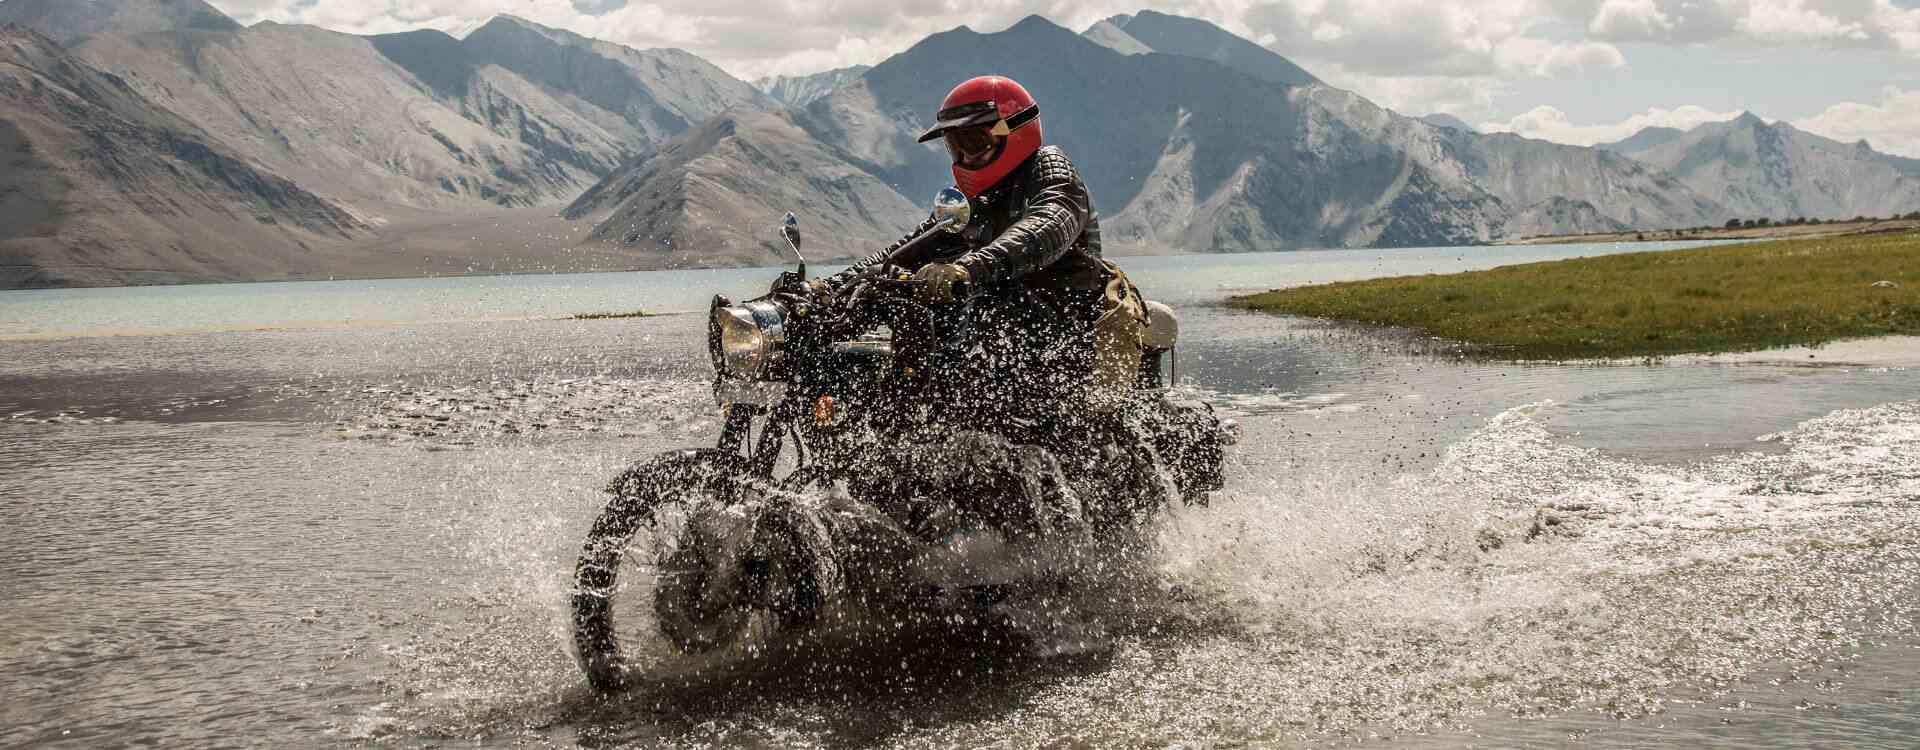 Bullet 500 Cf Moto 500cc Wiring Diagram Legendary Dependability